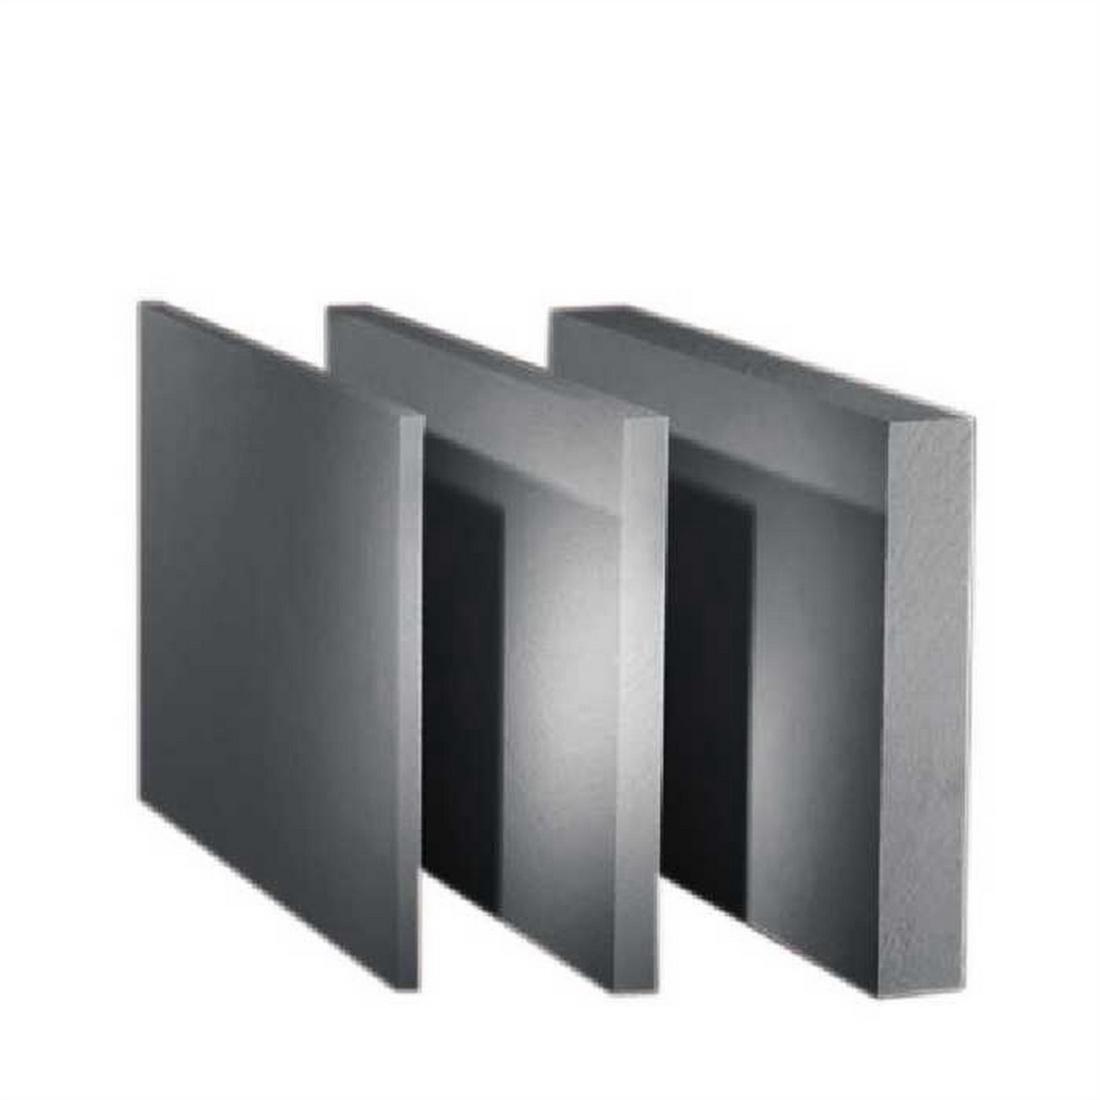 Expol Platinum Board 2400 x 1200 x 20mm R0.63 Black Expanded Polystyrene N2420